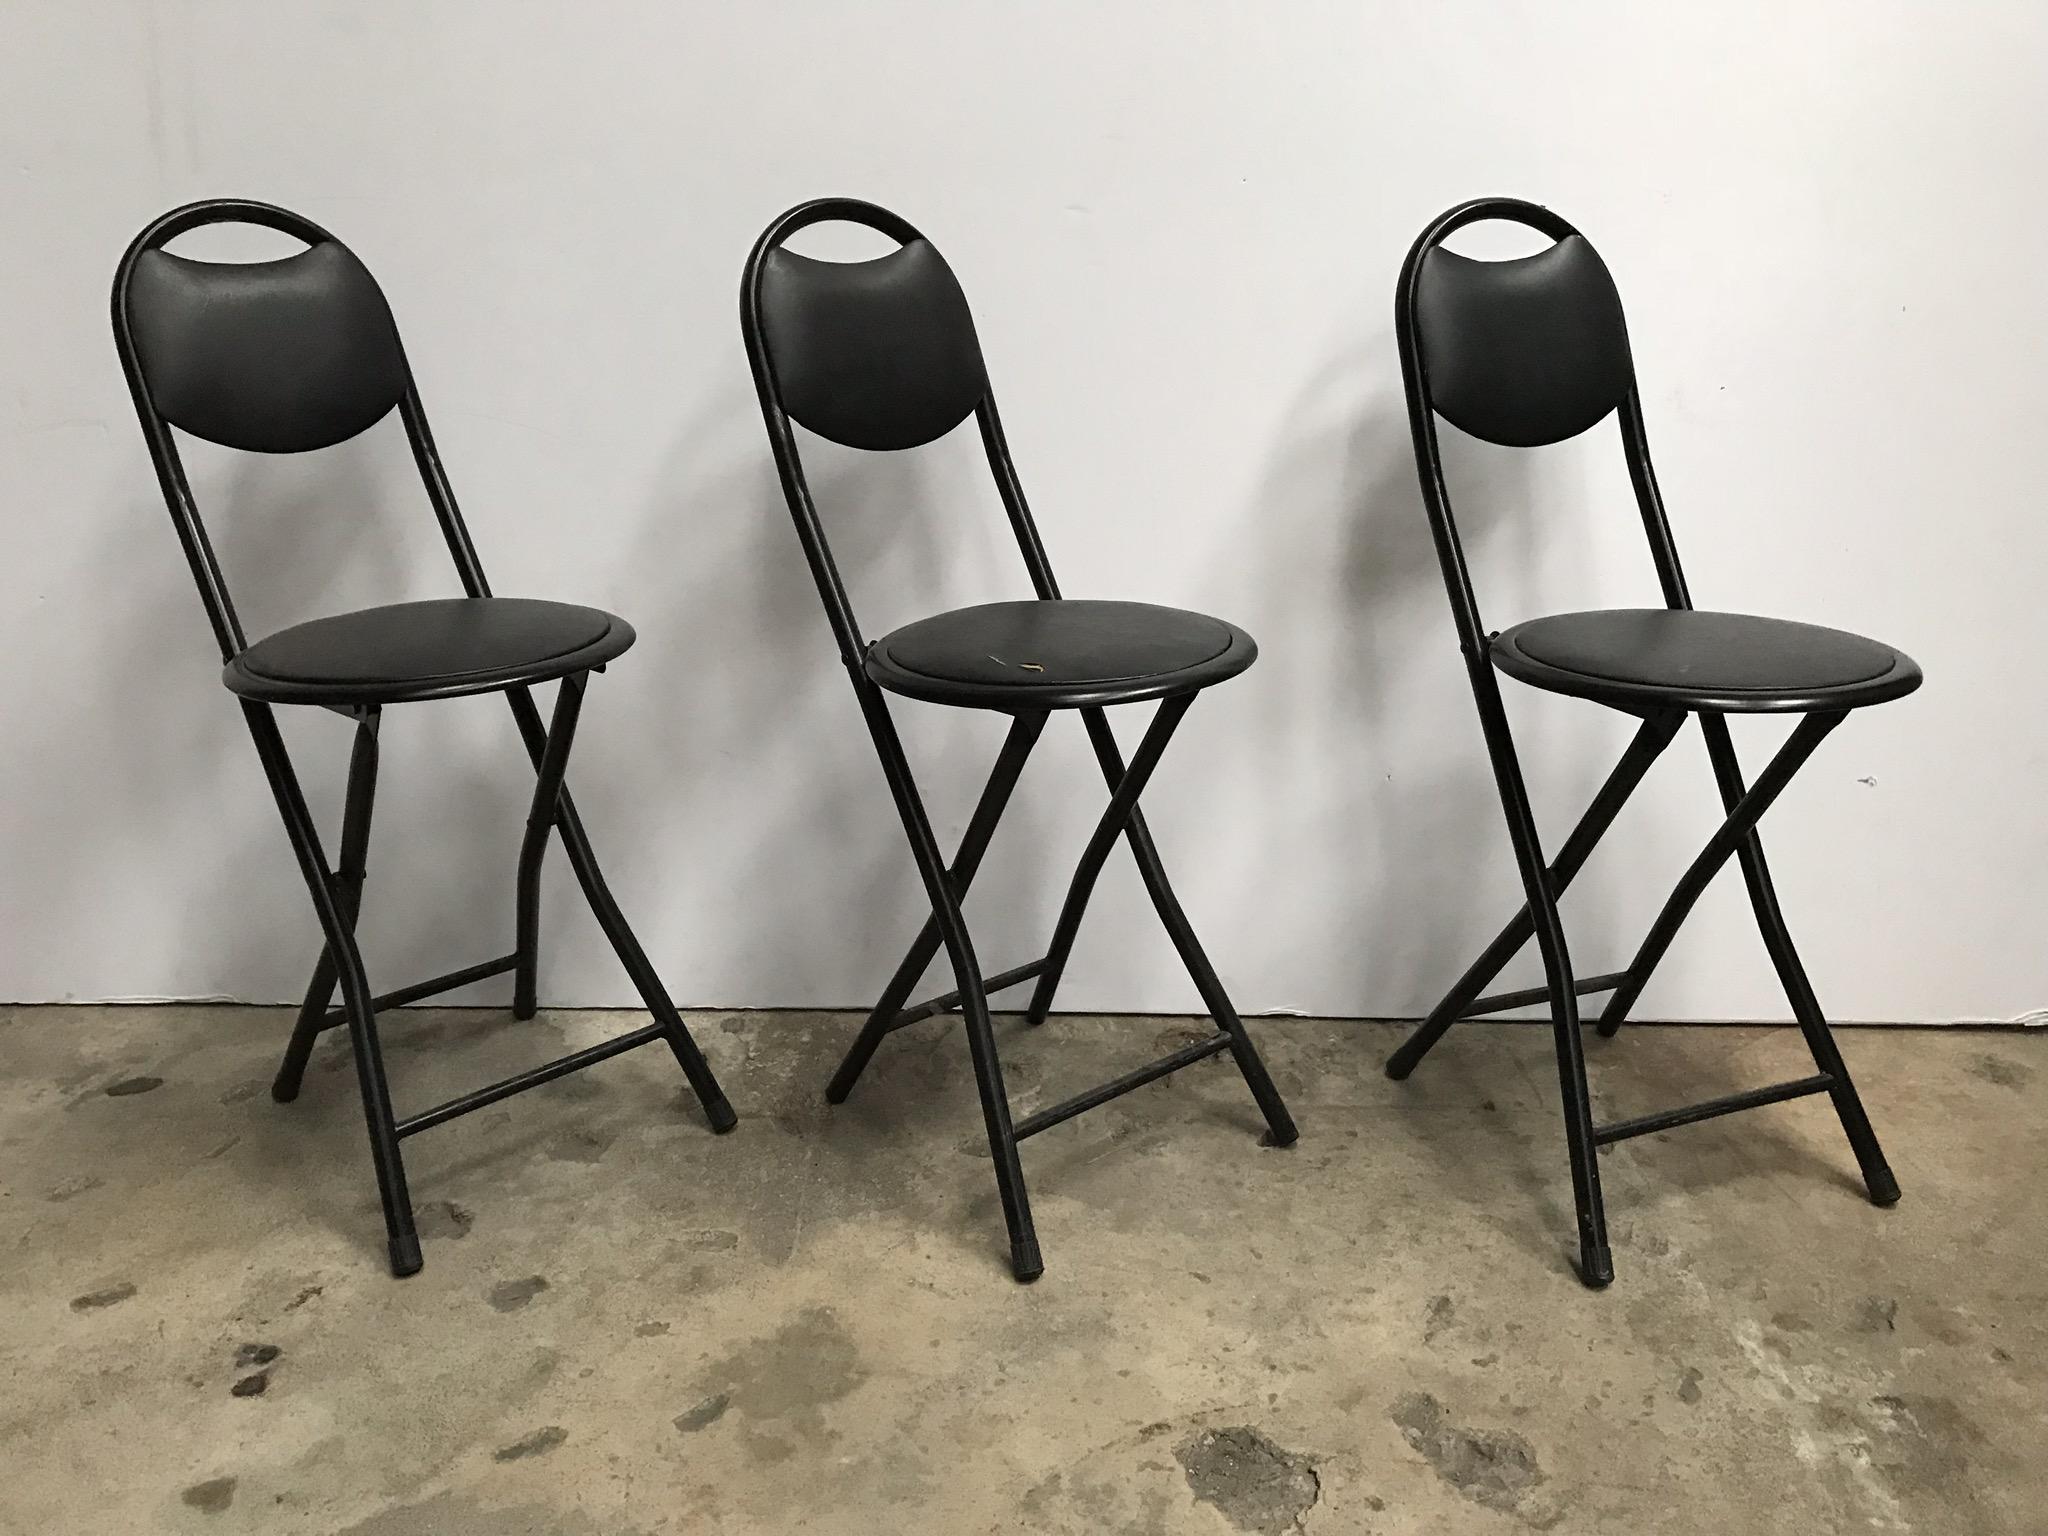 Musician's Folding Chairs (3) $25/ea